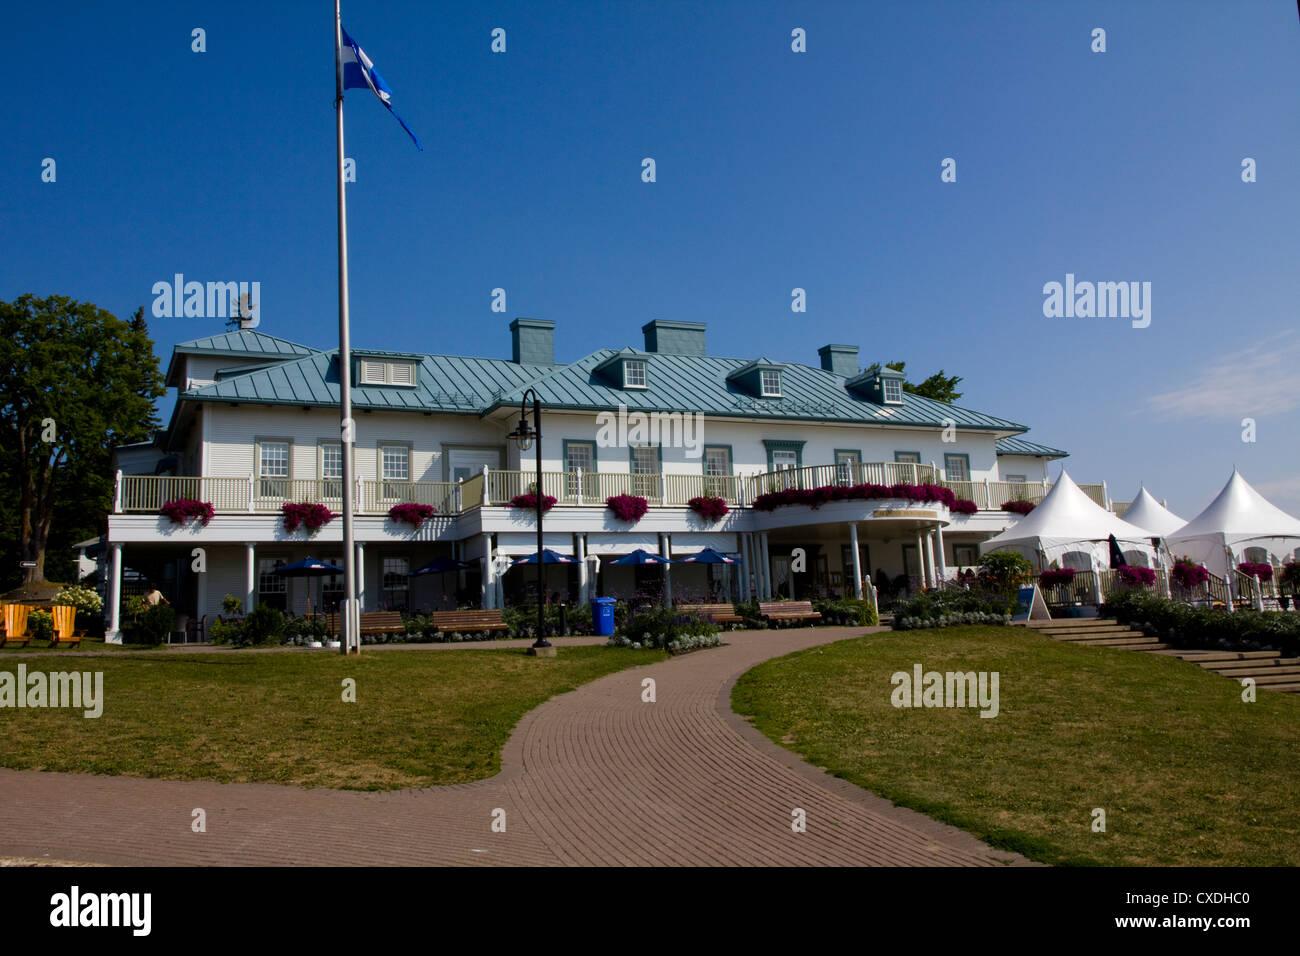 Centro visitatori Manoir Montmorency a Montmorency Falls Park, vicino a Quebec City, in Canada Foto Stock